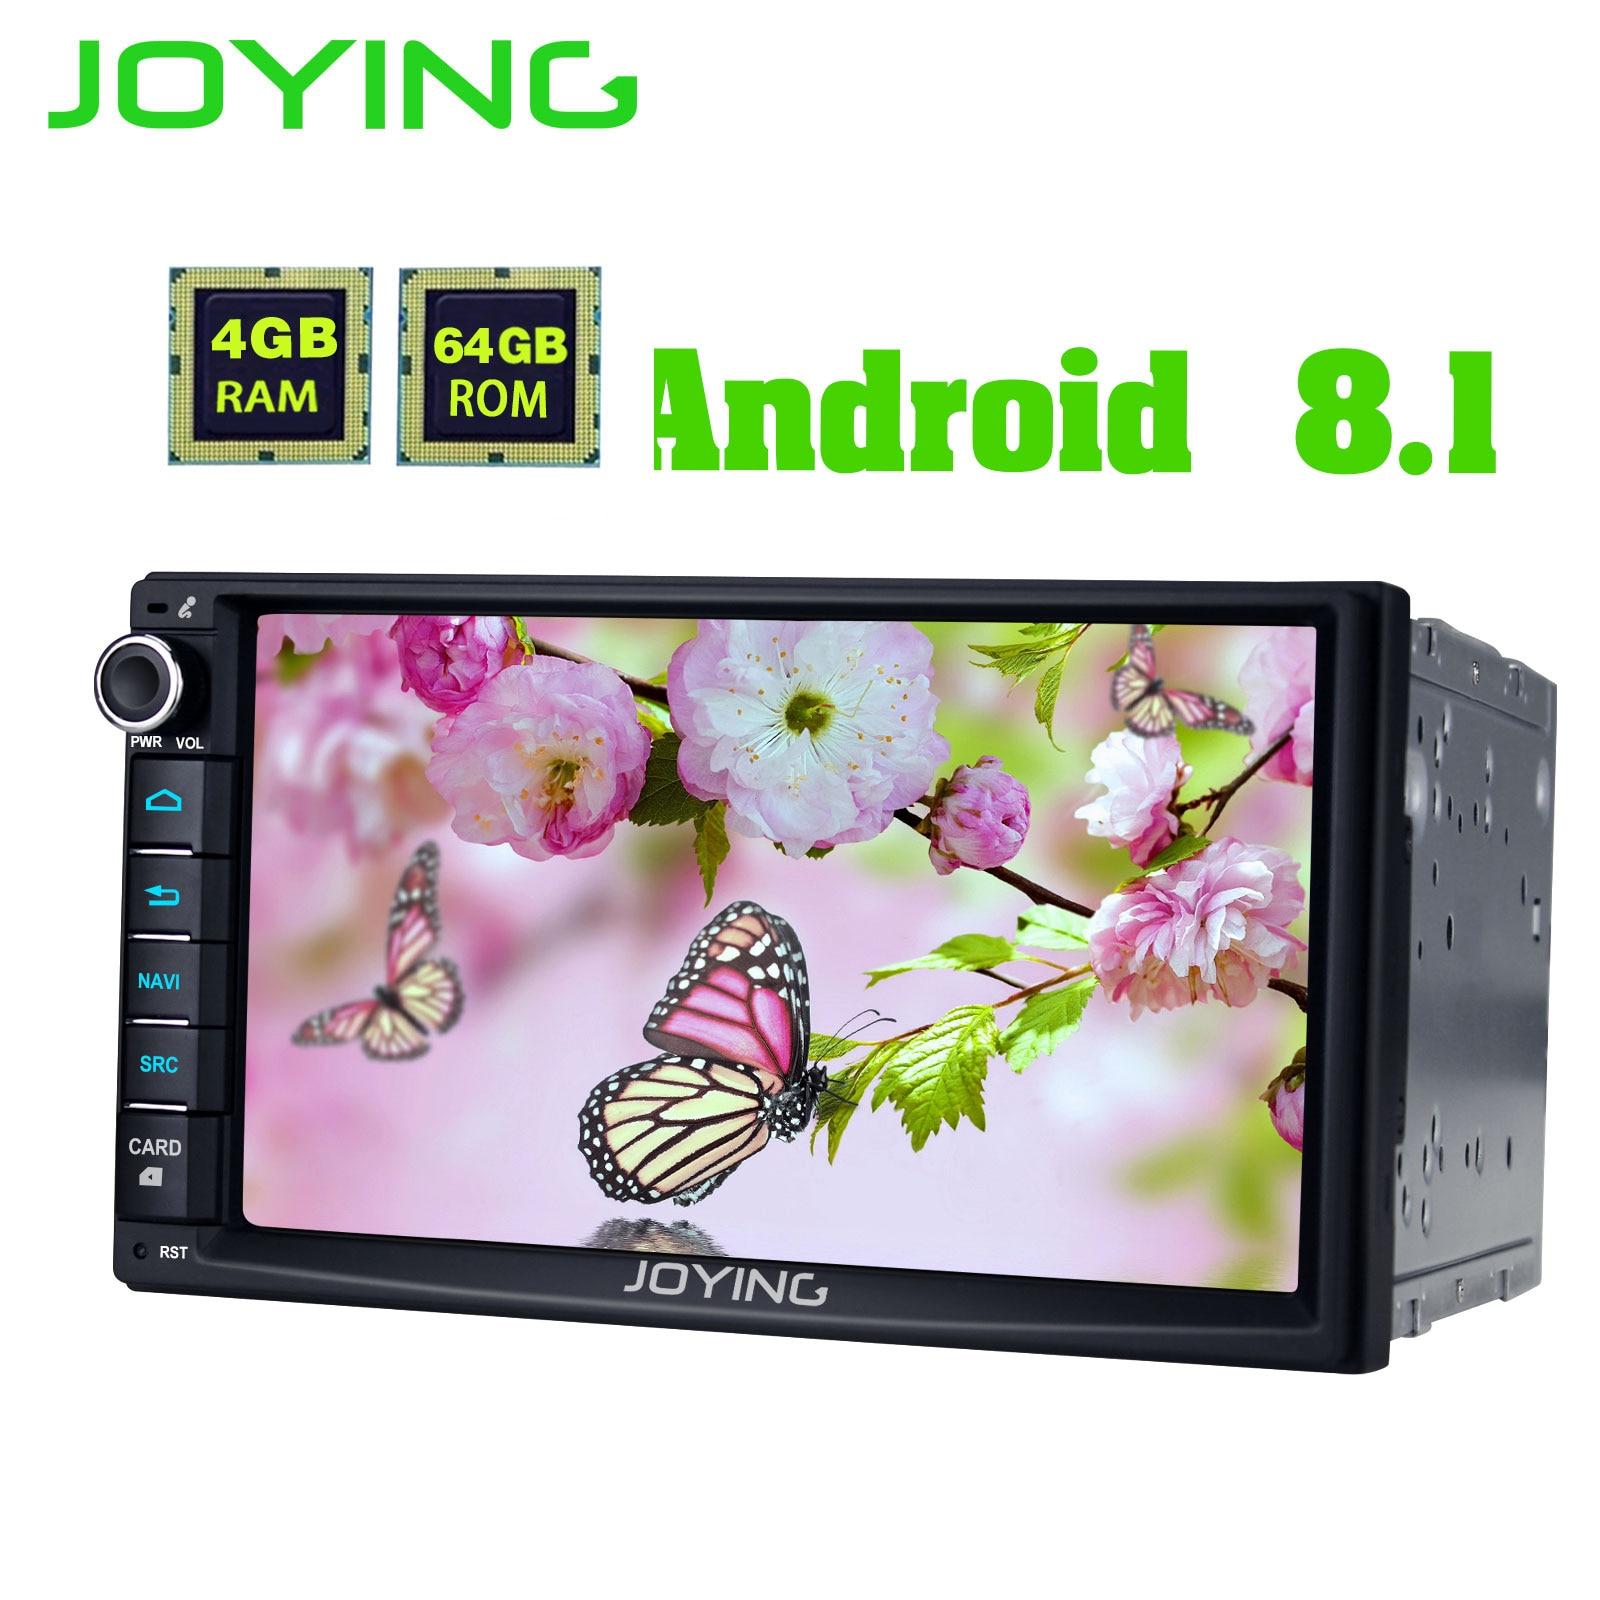 JOYING 2 din car radio autoradio universal 4GB 64GB GPS support SIM Card Android 8 1